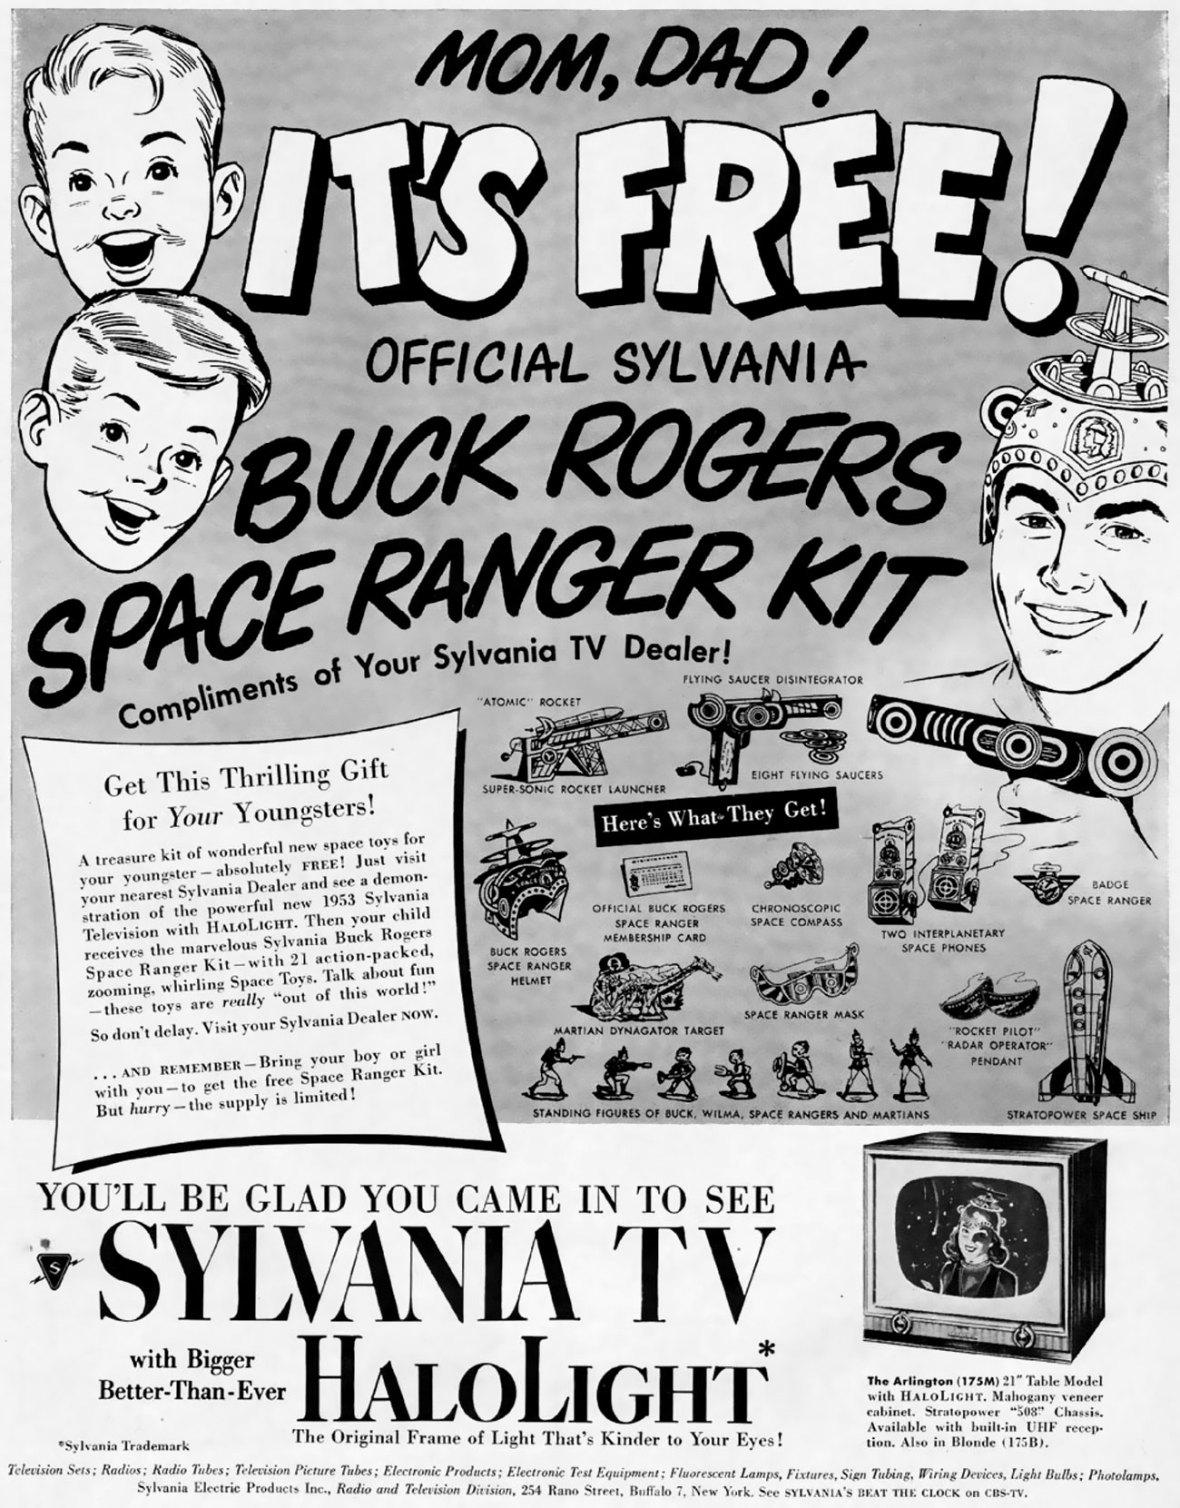 Sylvania featuring Buck Rogers Space Ranger Kit - 1952